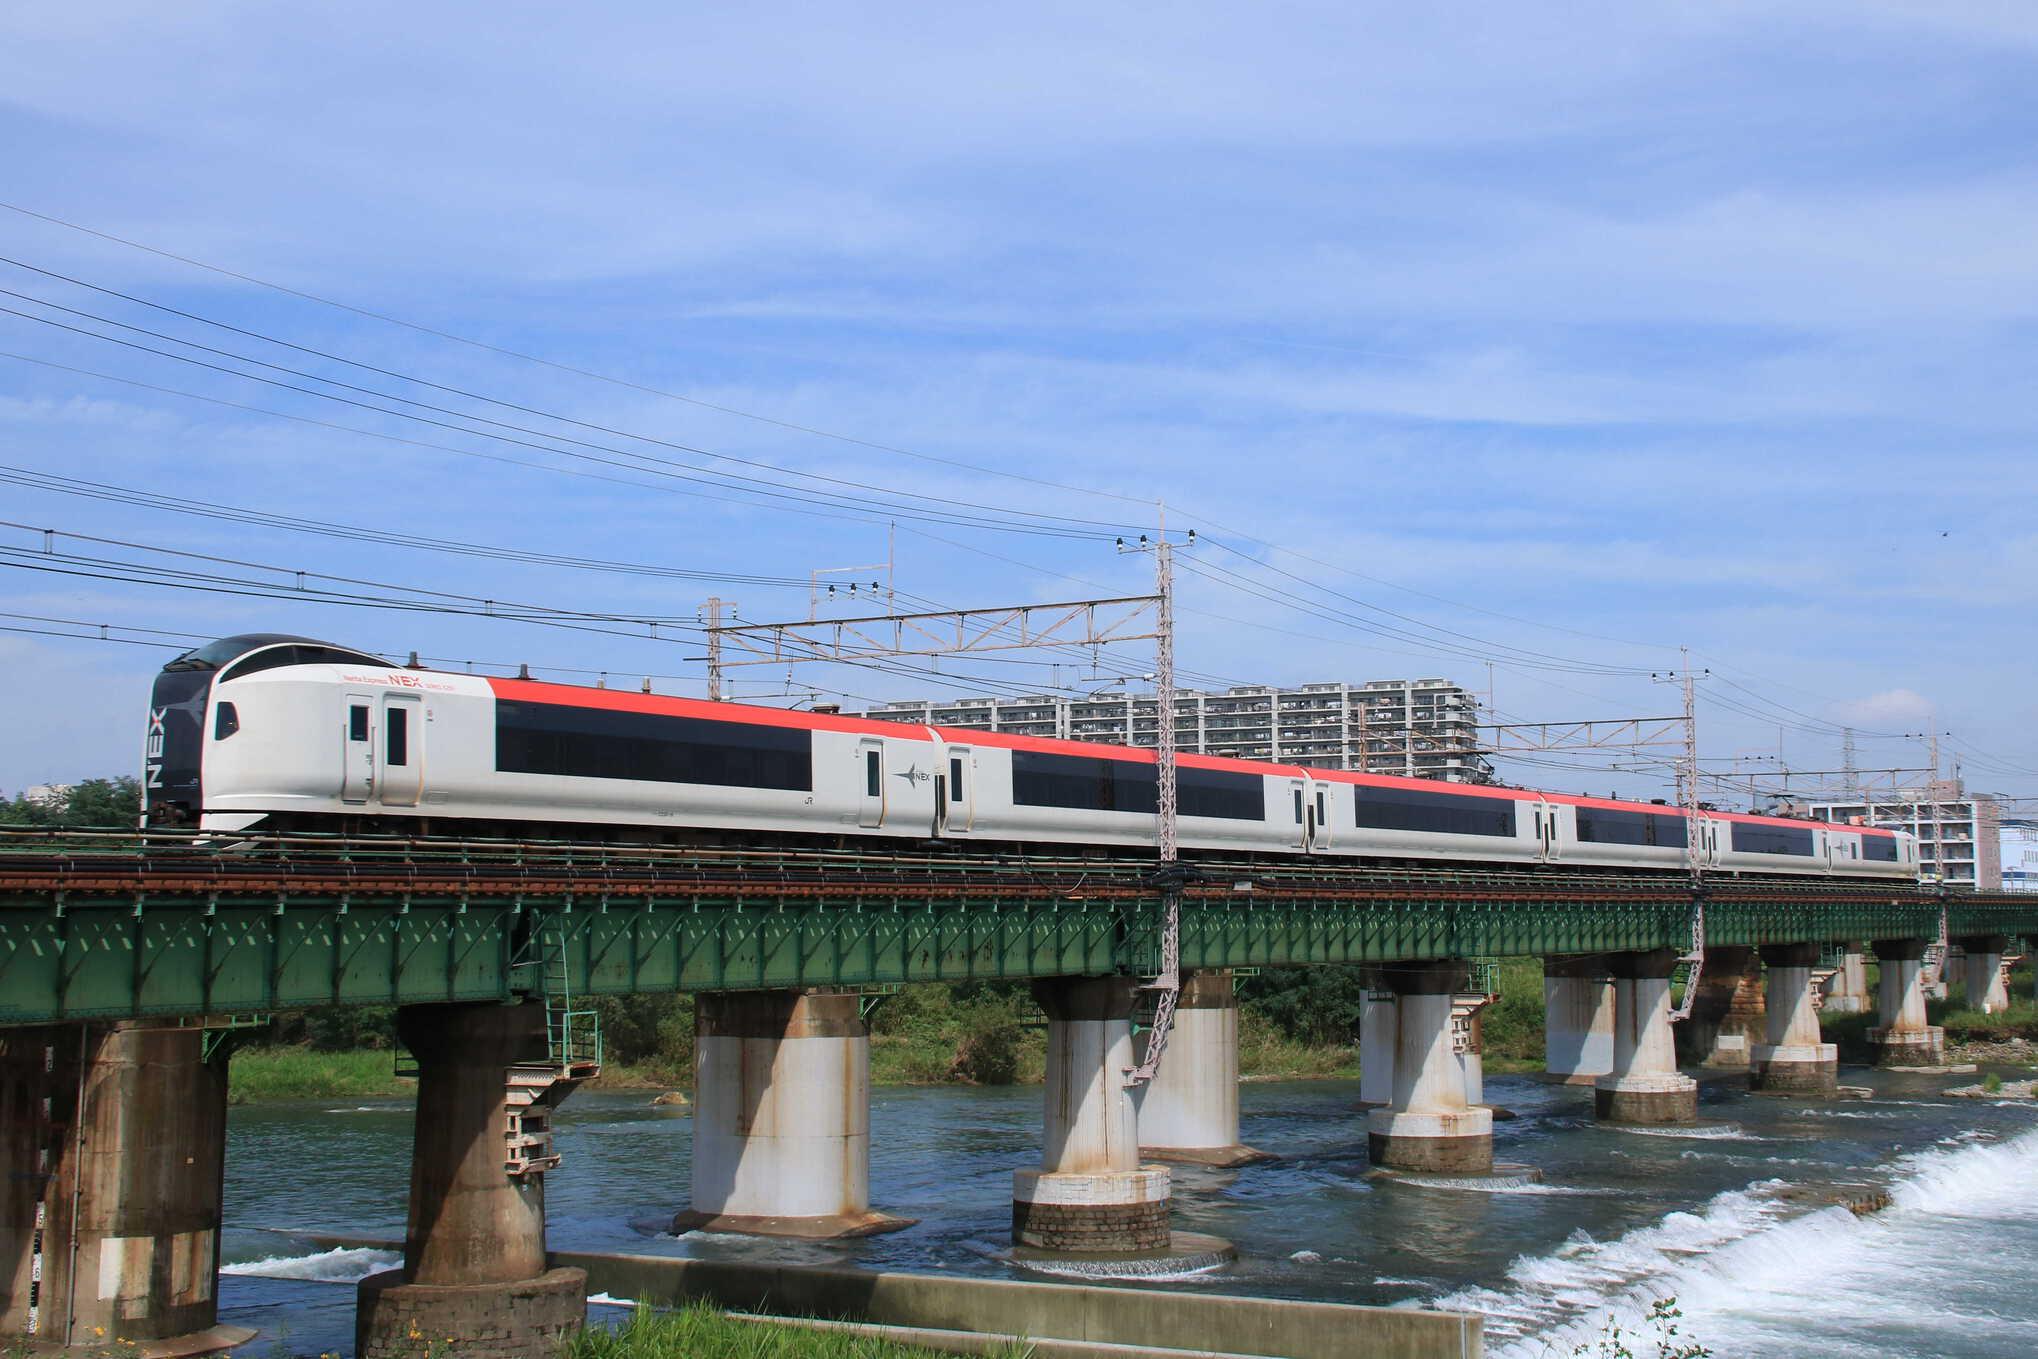 9208M 特急 成田エクスプレス8号 E259系 横クラNe015編成